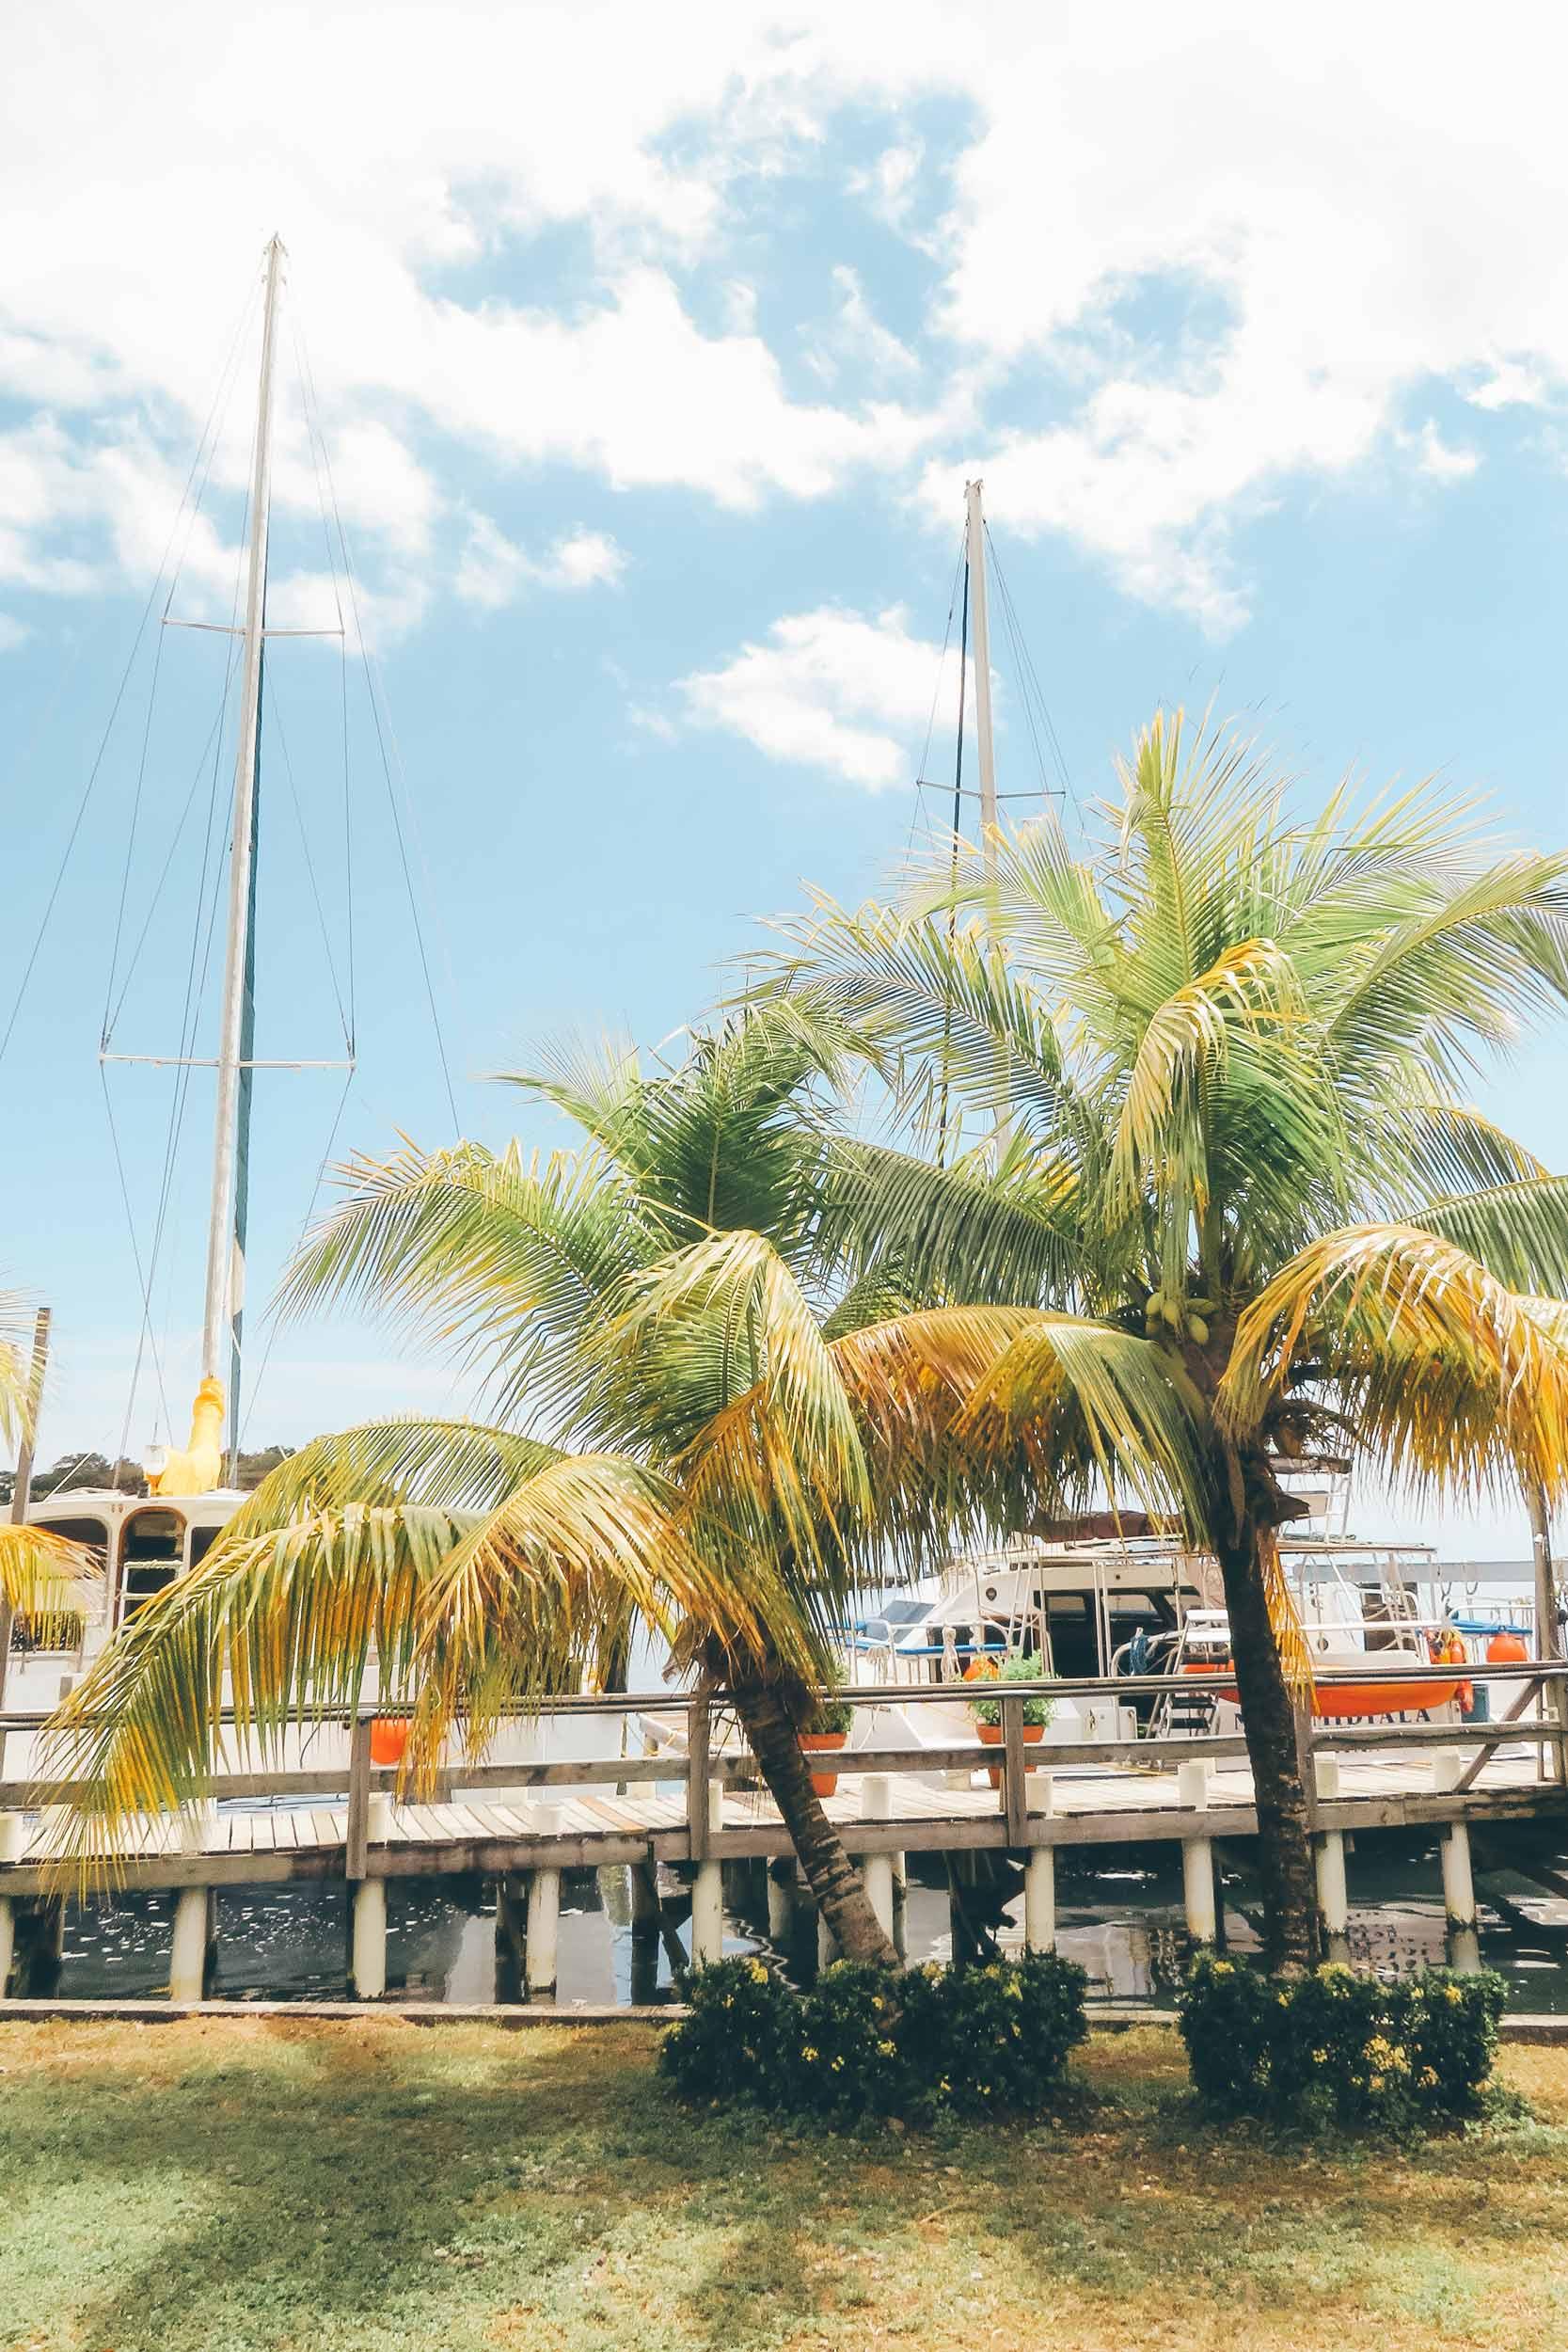 Mittelamerika-Kreuzfahrt-Roatan-Honduras-Ausflug-Palmen